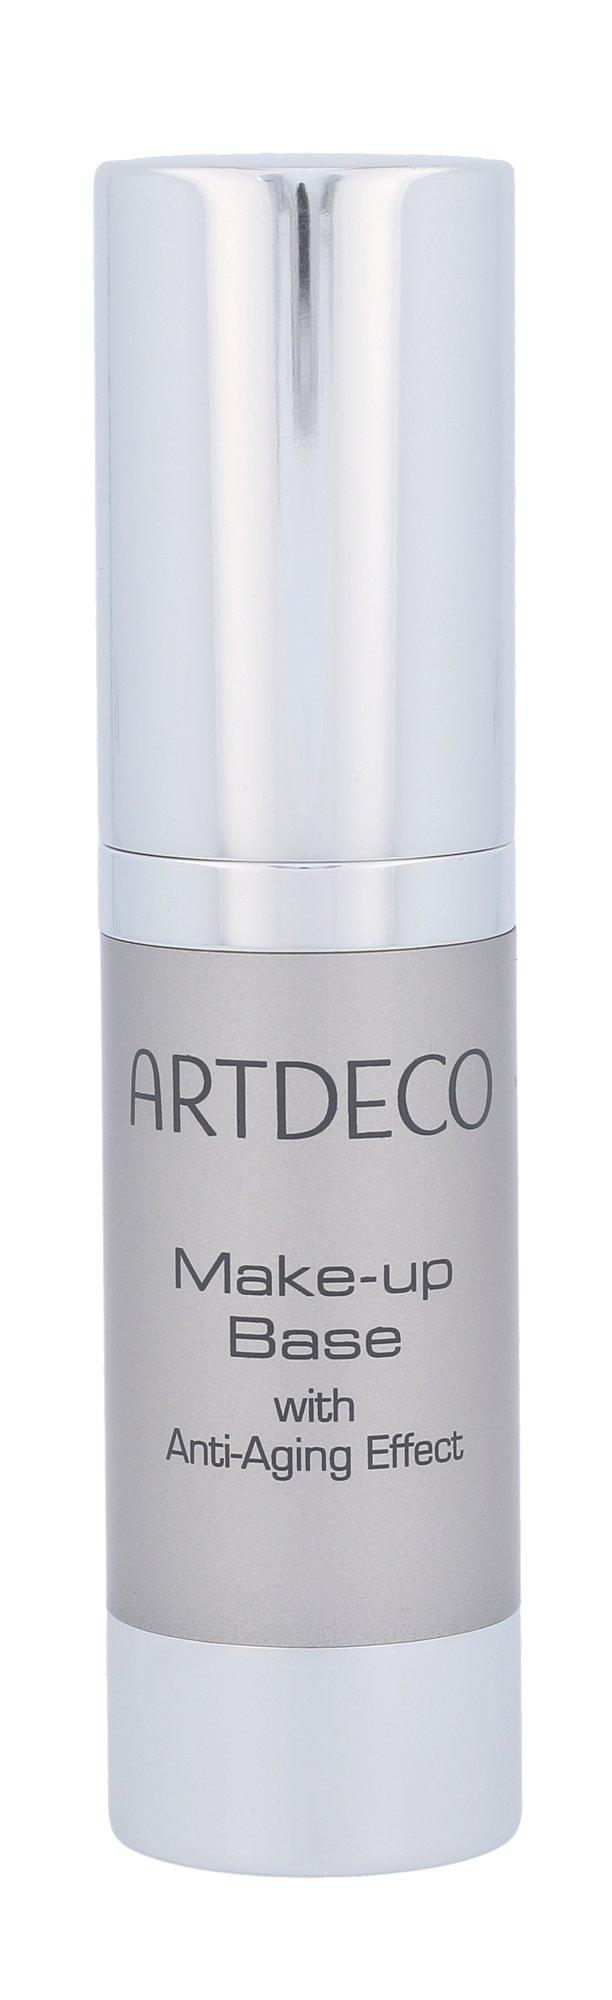 Artdeco Make-up Base With Anti-Aging Effect 15 ml